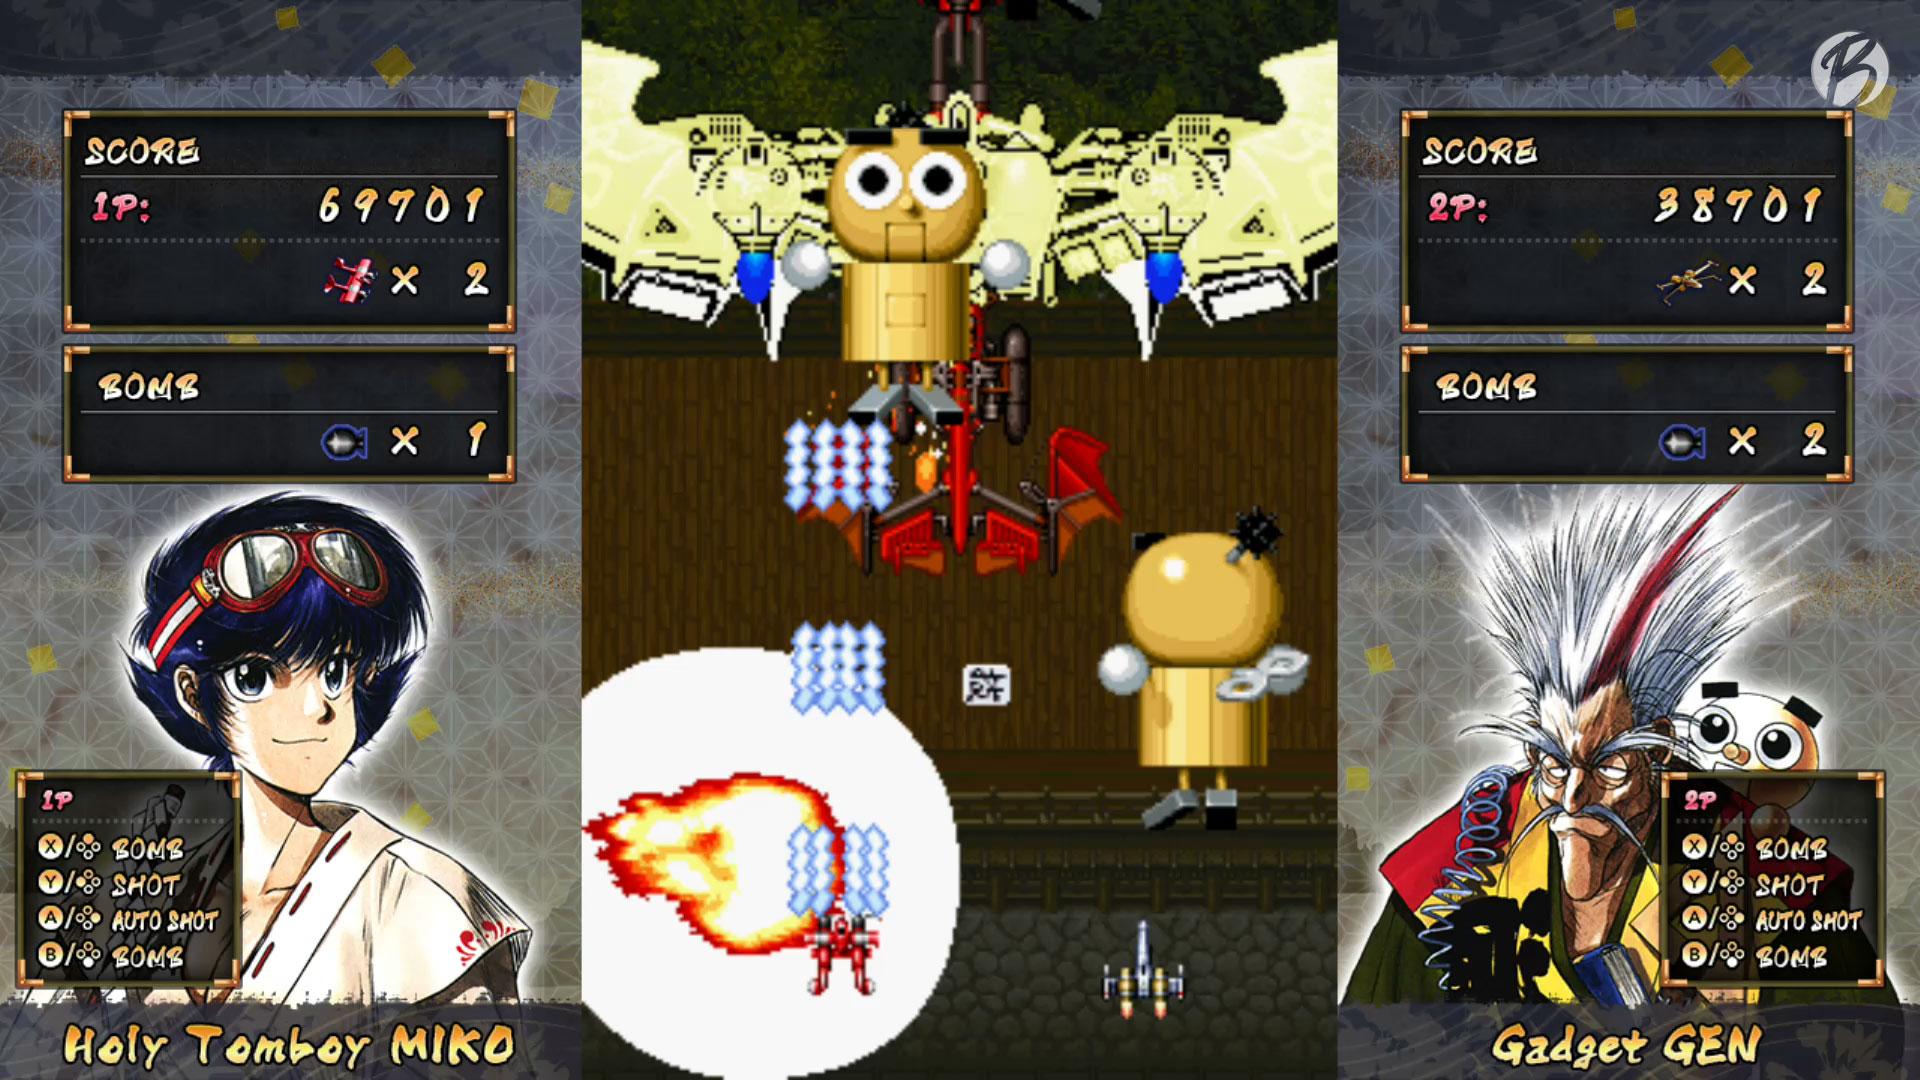 Samurai Aces Episode I - Ulti/Bomb Gadget Gen